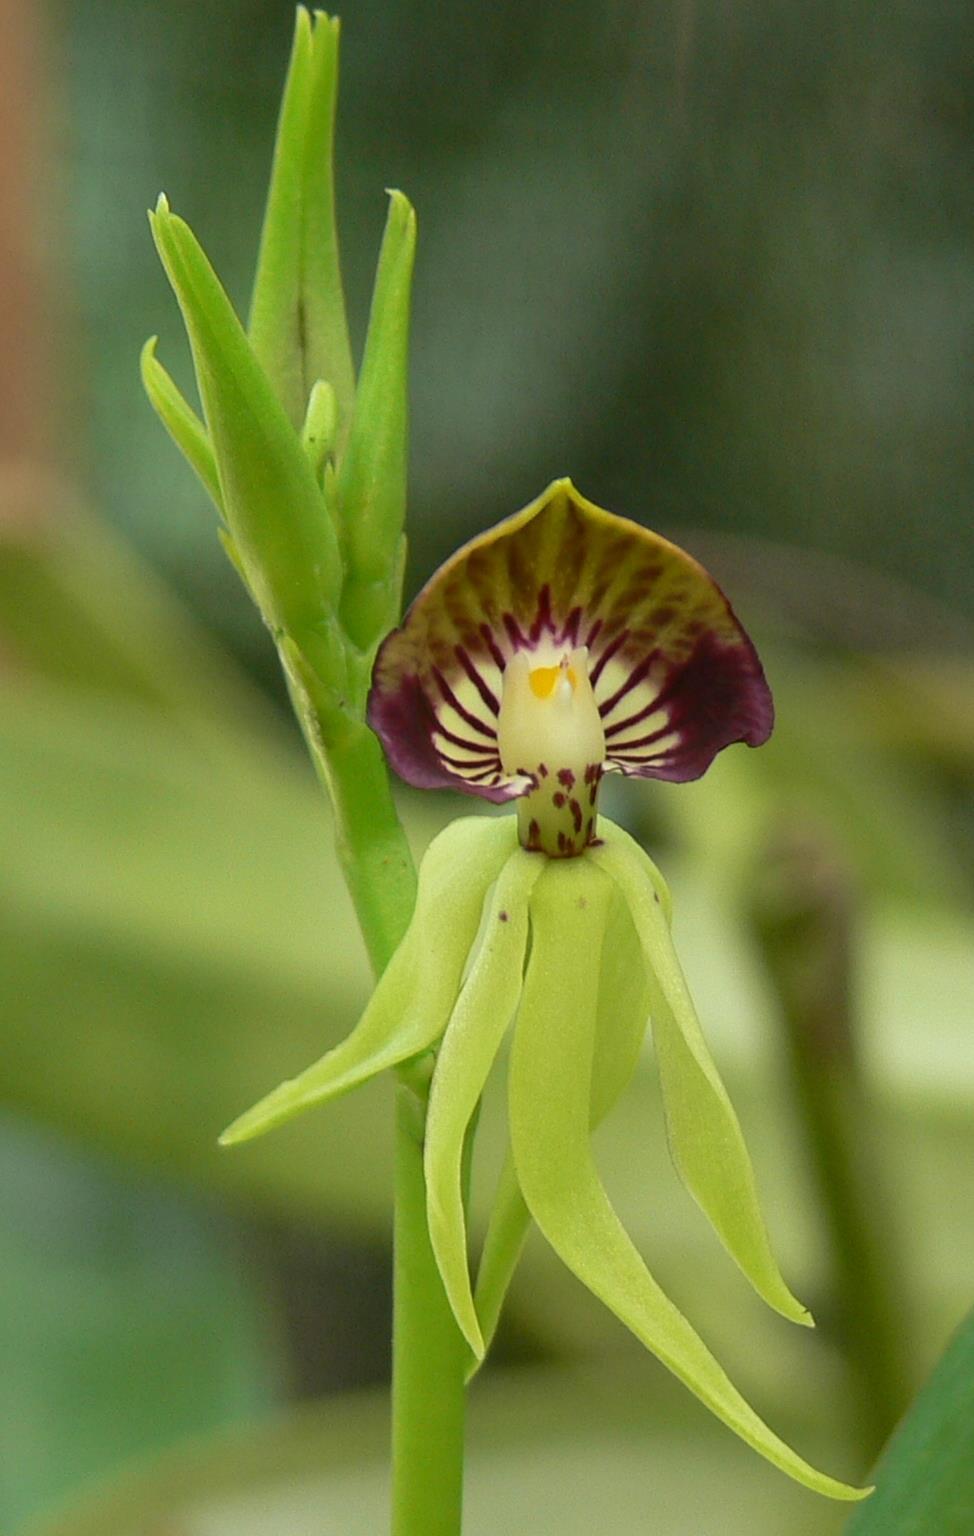 The Black Orchid – Belize's National Flower & CB's Botanical Garden